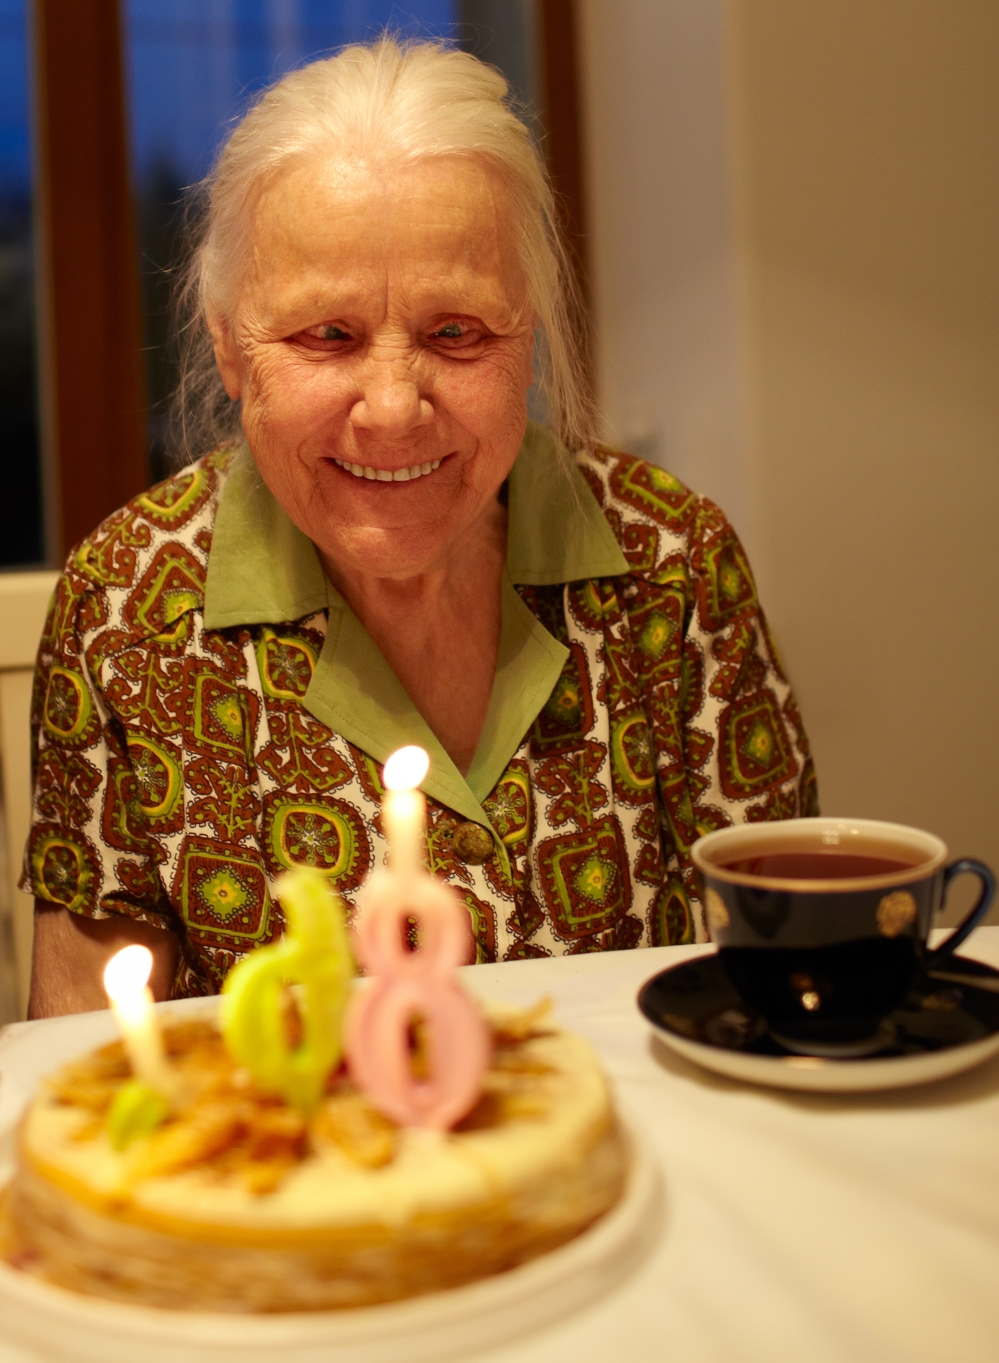 Grandmother's 86th birthday.